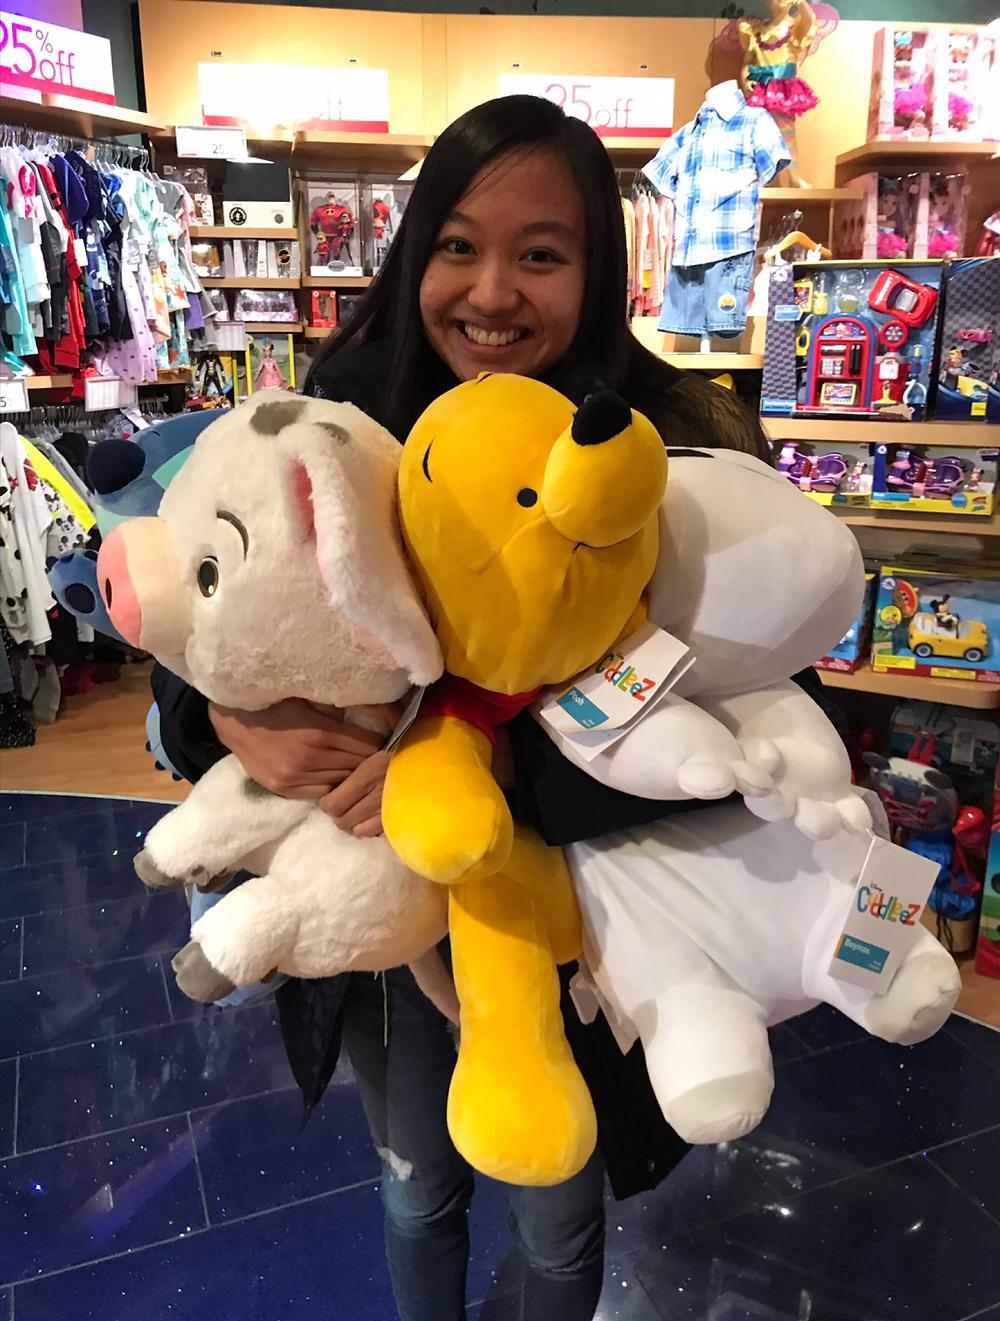 Casey holding 3 stuffed animals